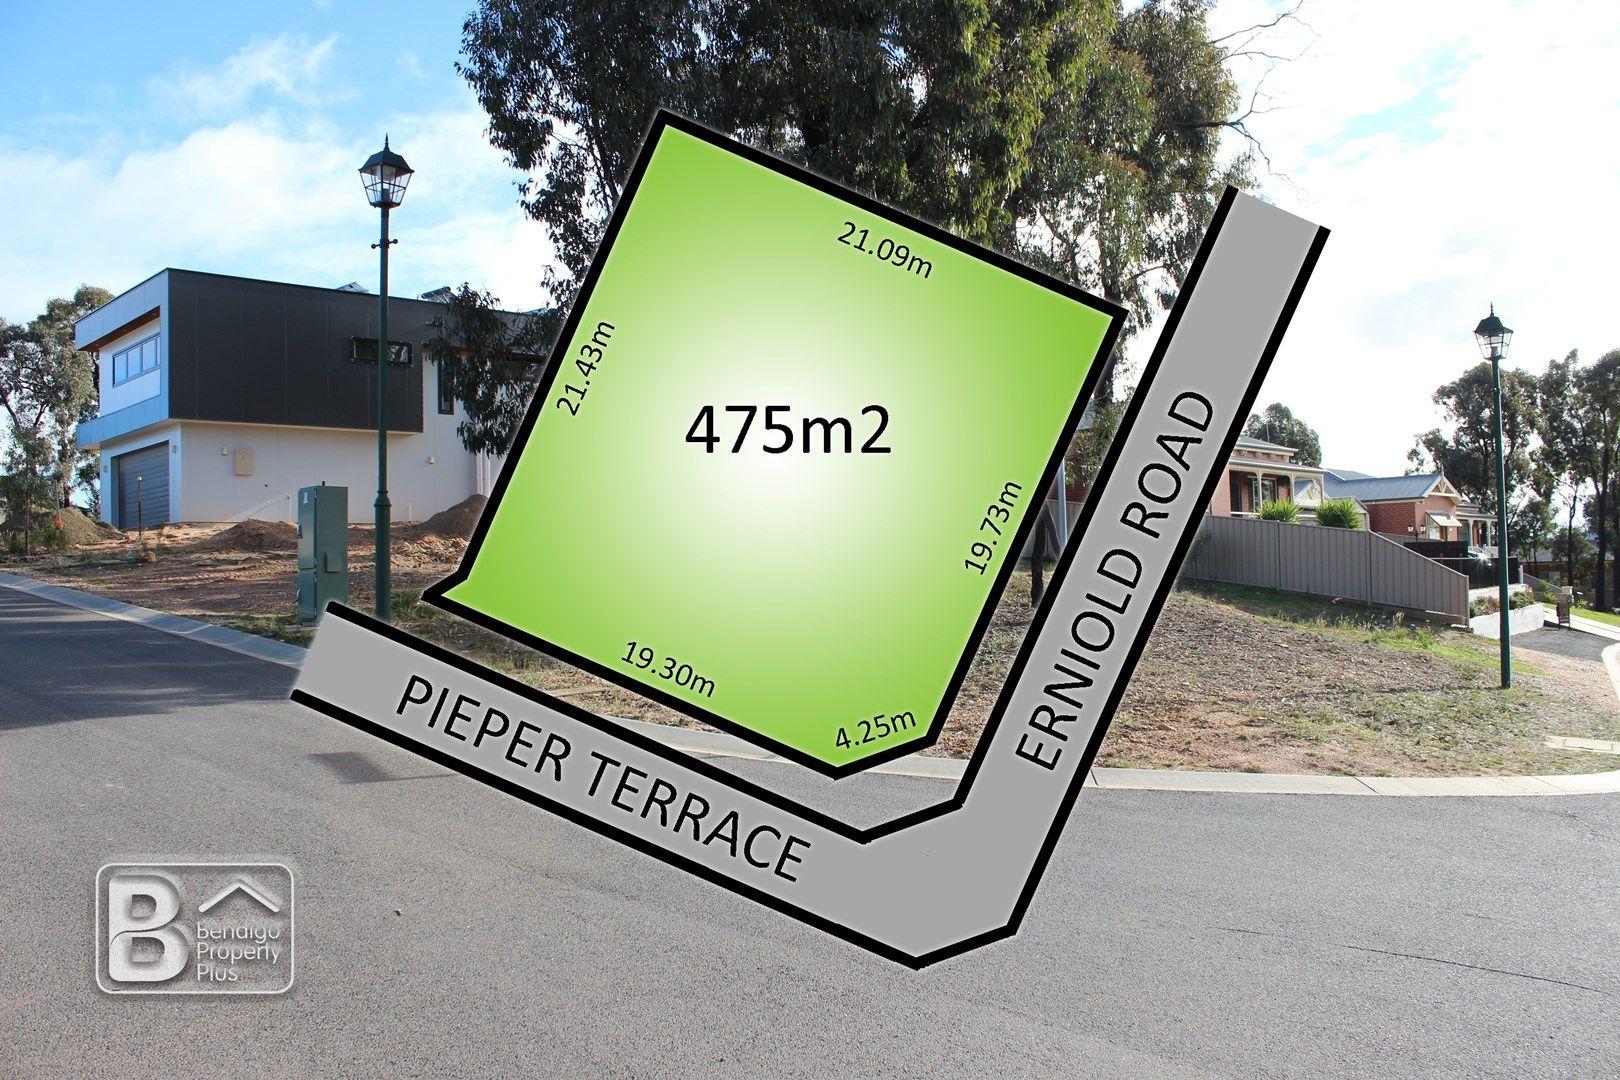 7 Pieper Terrace, Strathdale VIC 3550, Image 0